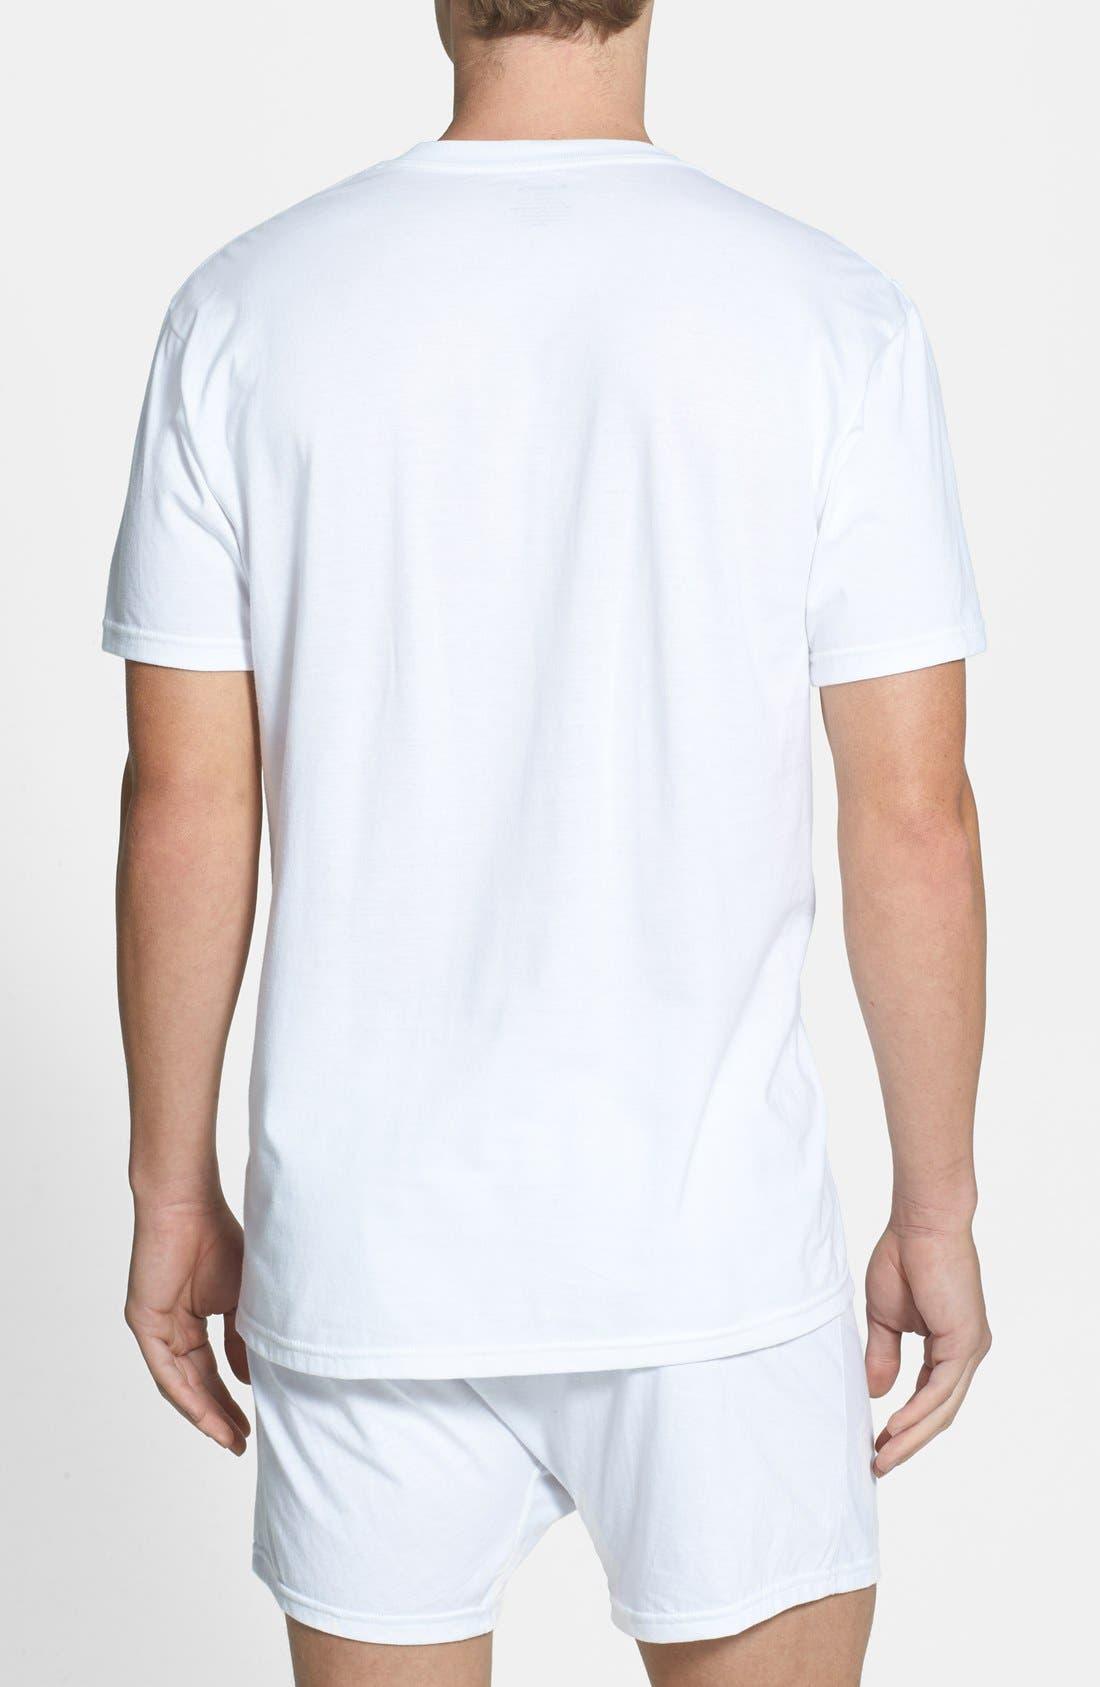 NORDSTROM MEN'S SHOP,                             Regular Fit 4-Pack Supima<sup>®</sup> Cotton T-Shirts,                             Alternate thumbnail 8, color,                             WHITE